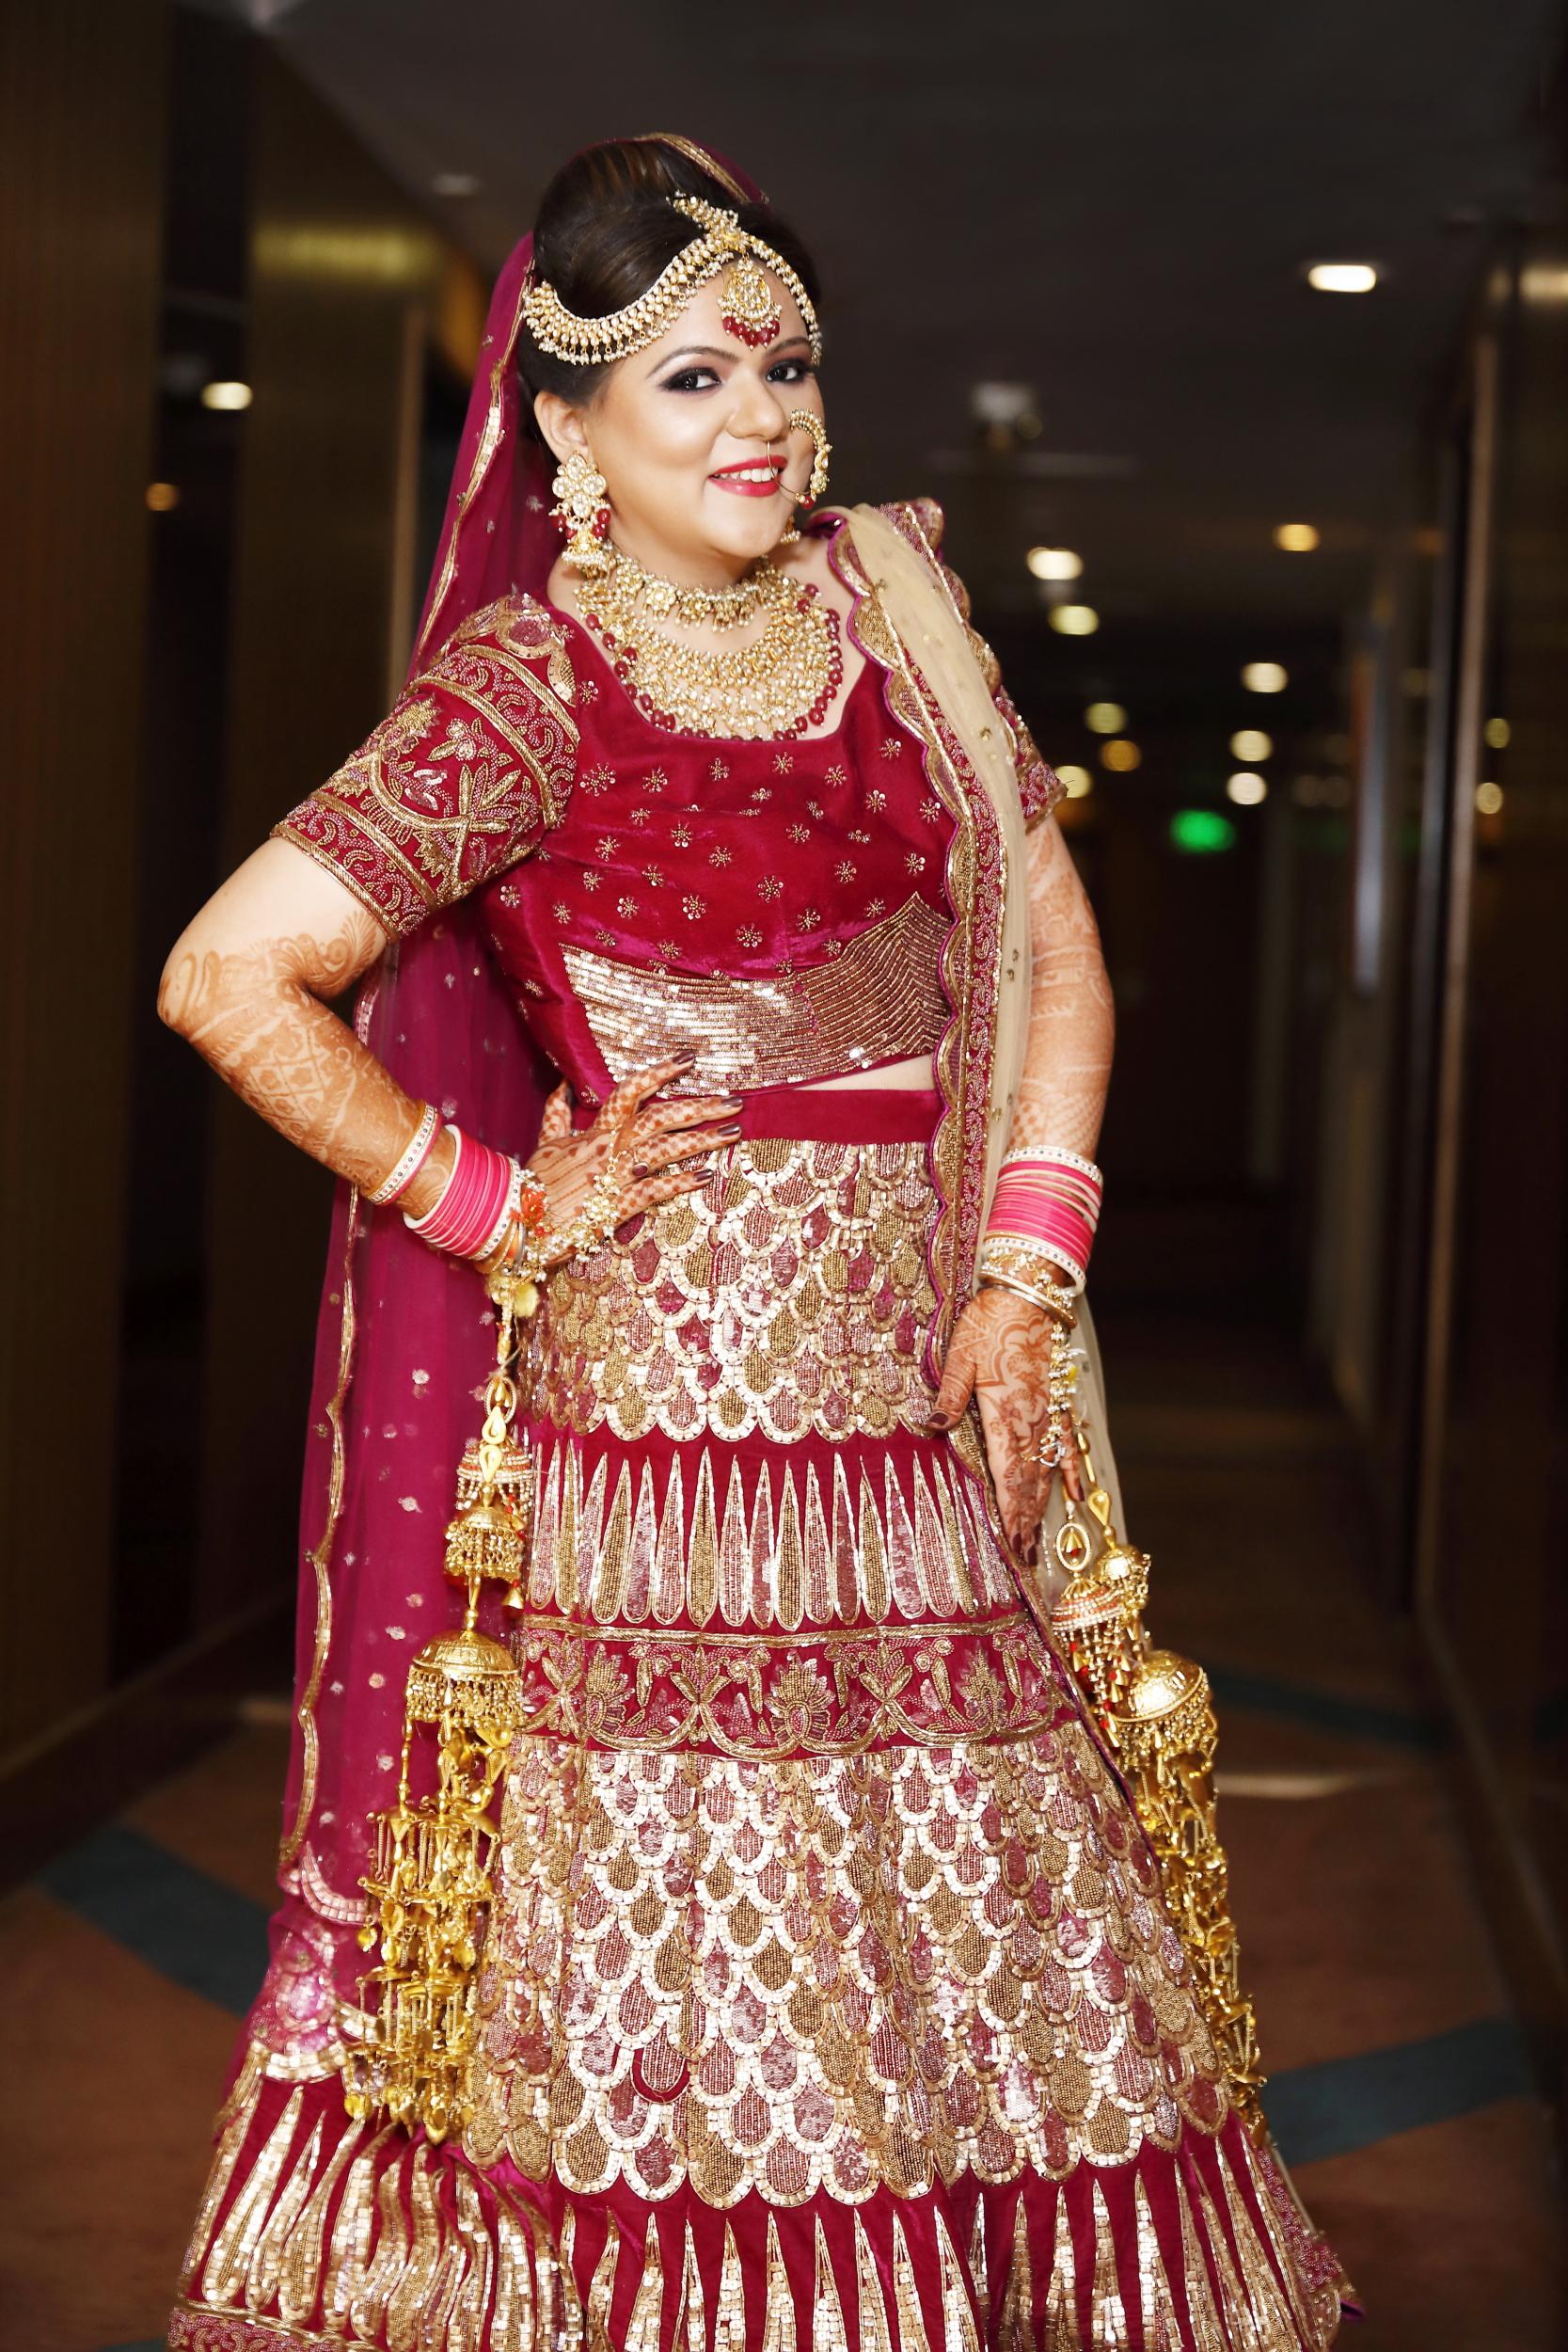 Candid wedding photographersC69A0709 Delhi